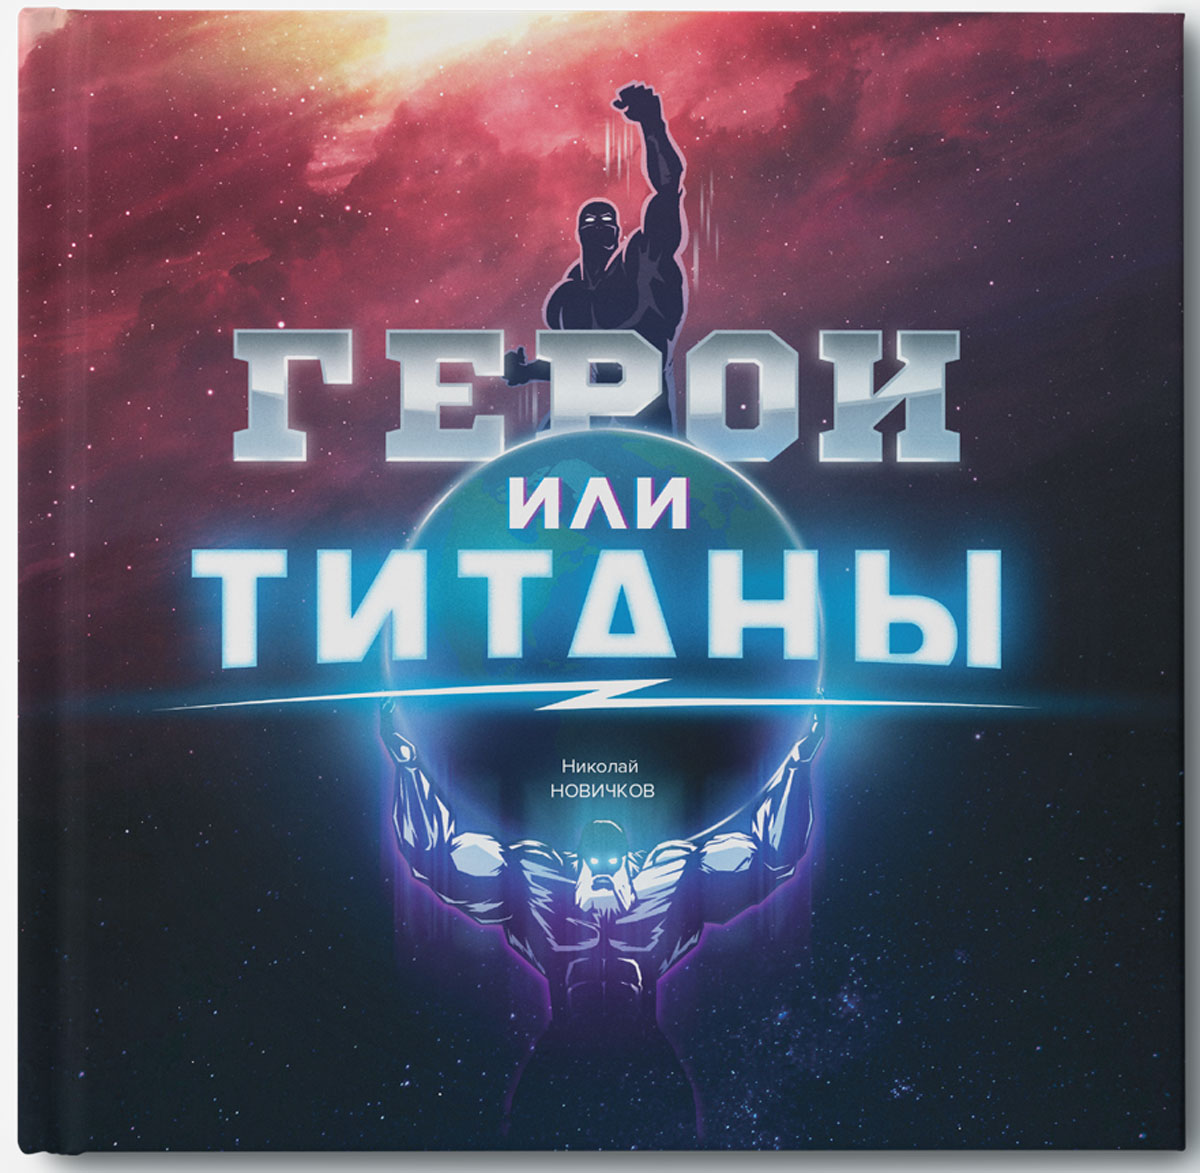 Zakazat.ru Герои или титаны. Николай Новичков